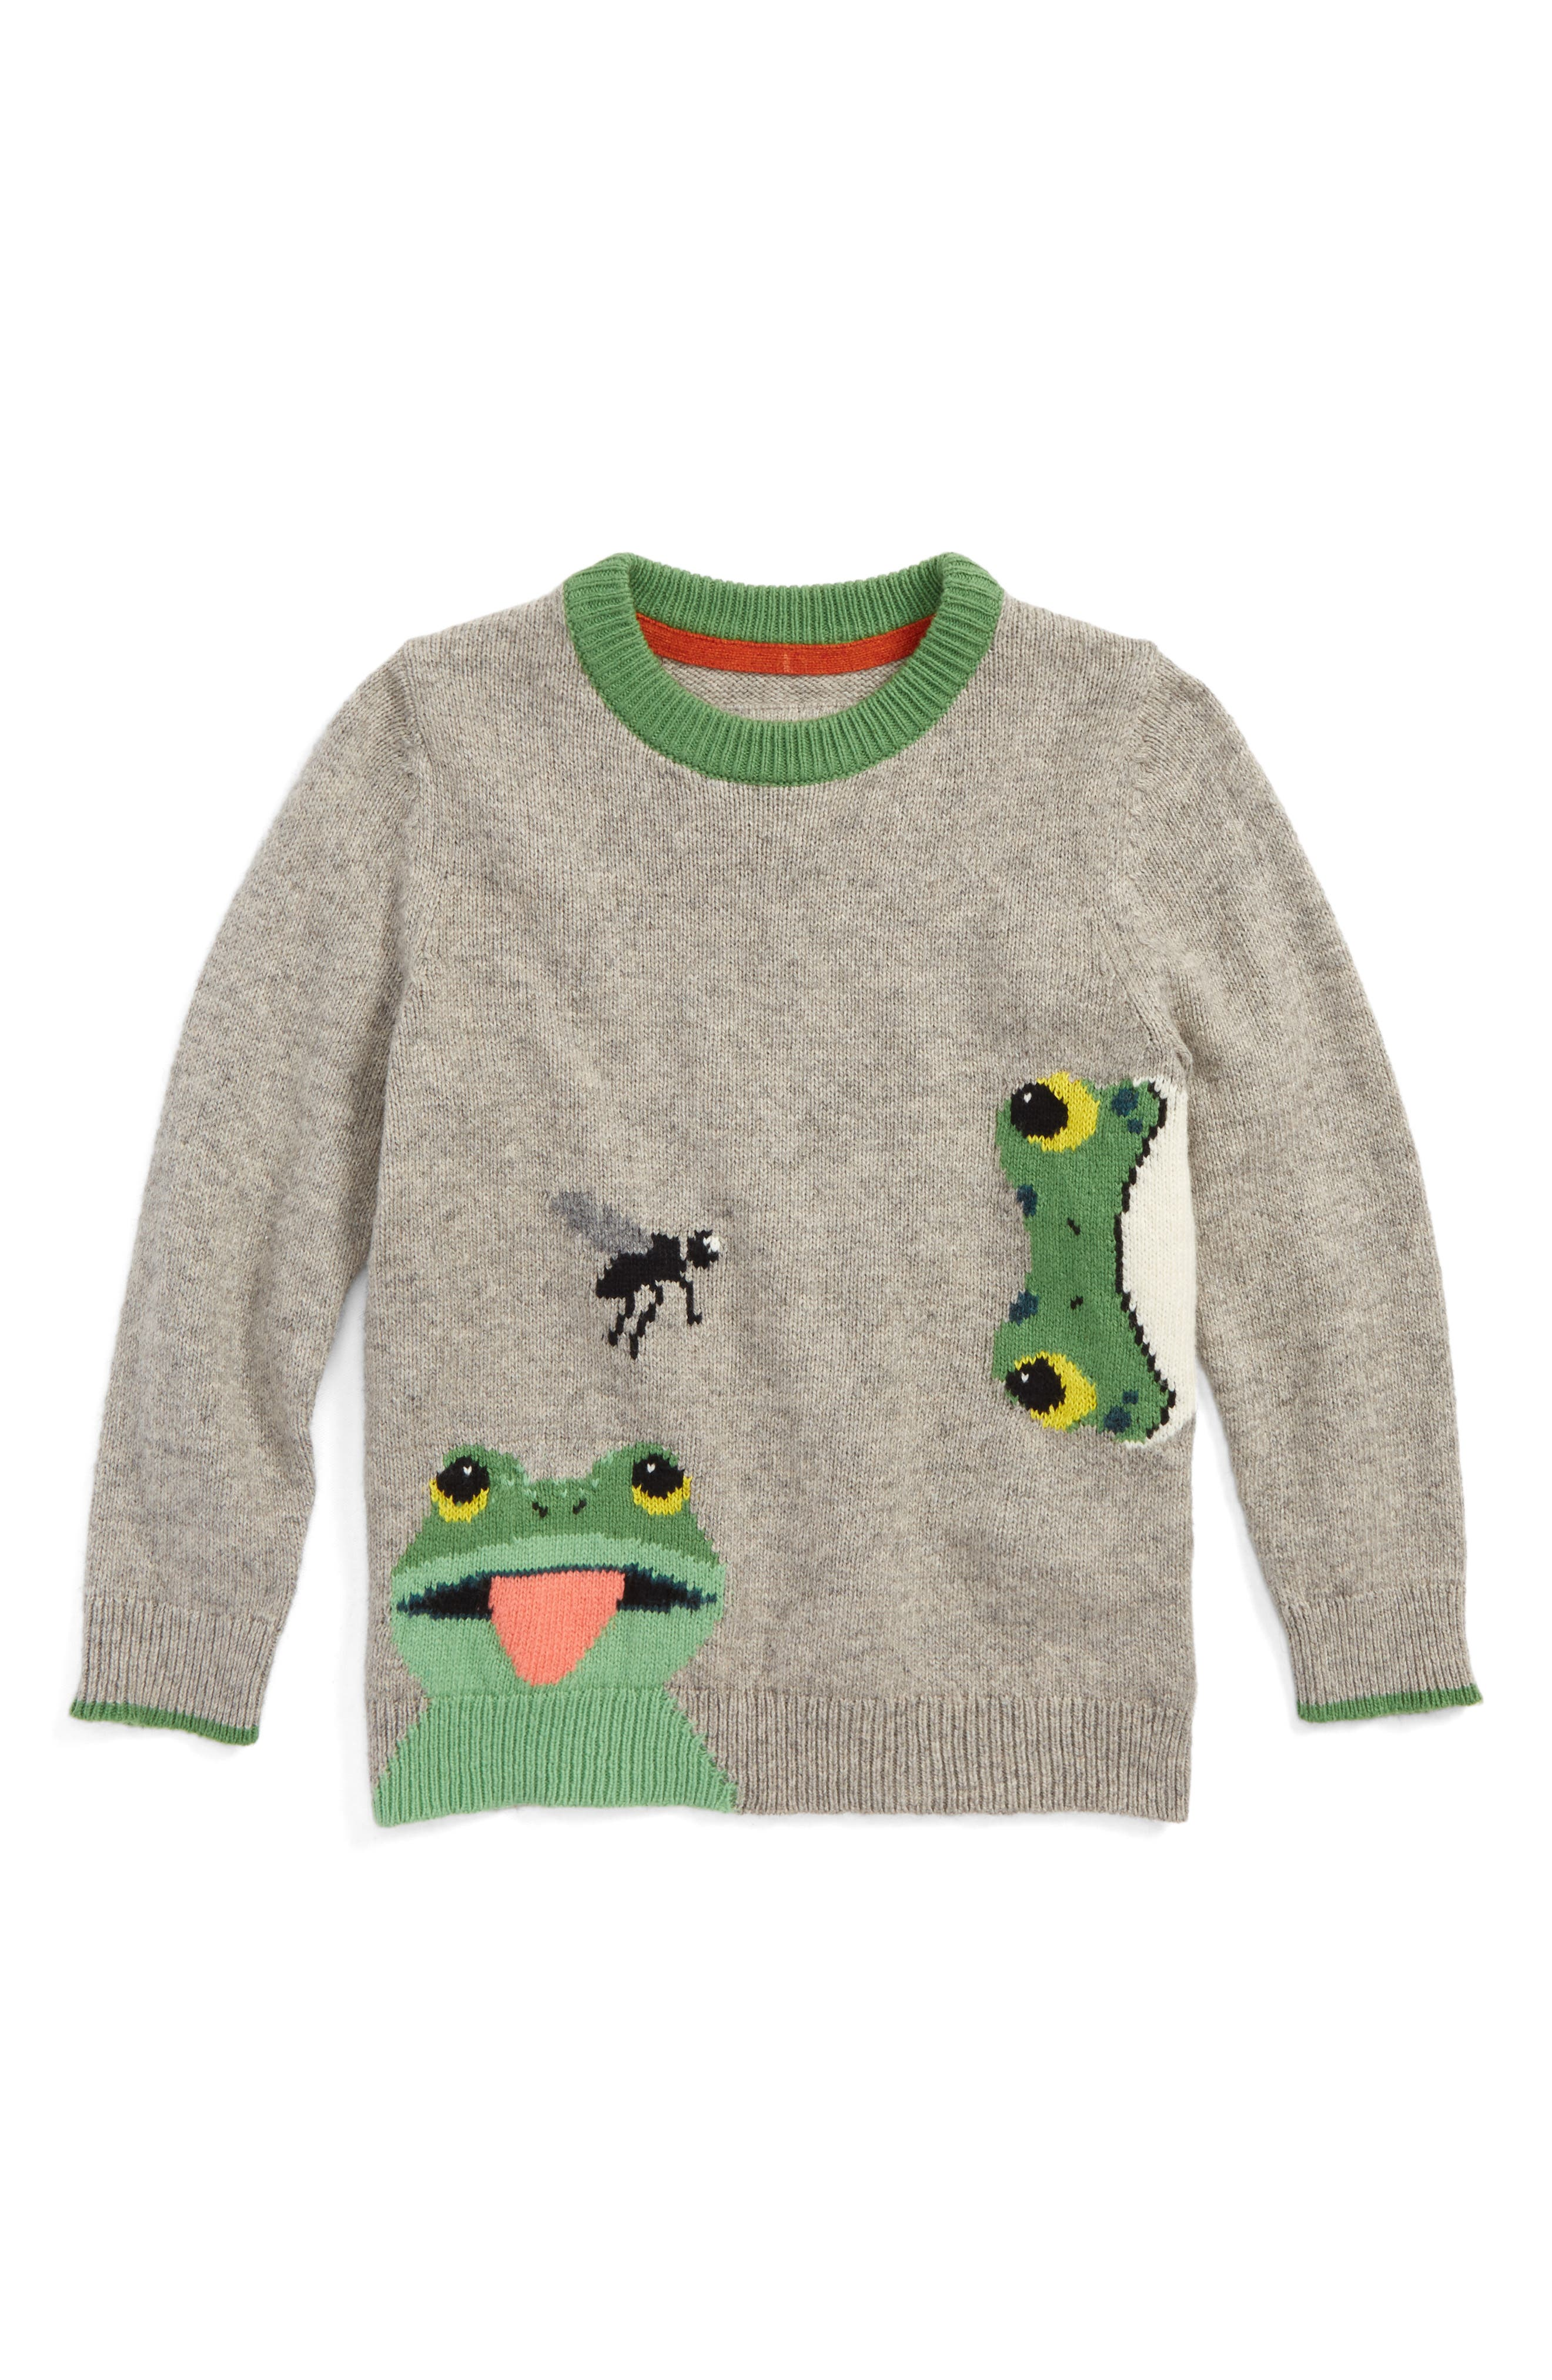 Wild Adventure Intarsia Sweater,                             Main thumbnail 1, color,                             062